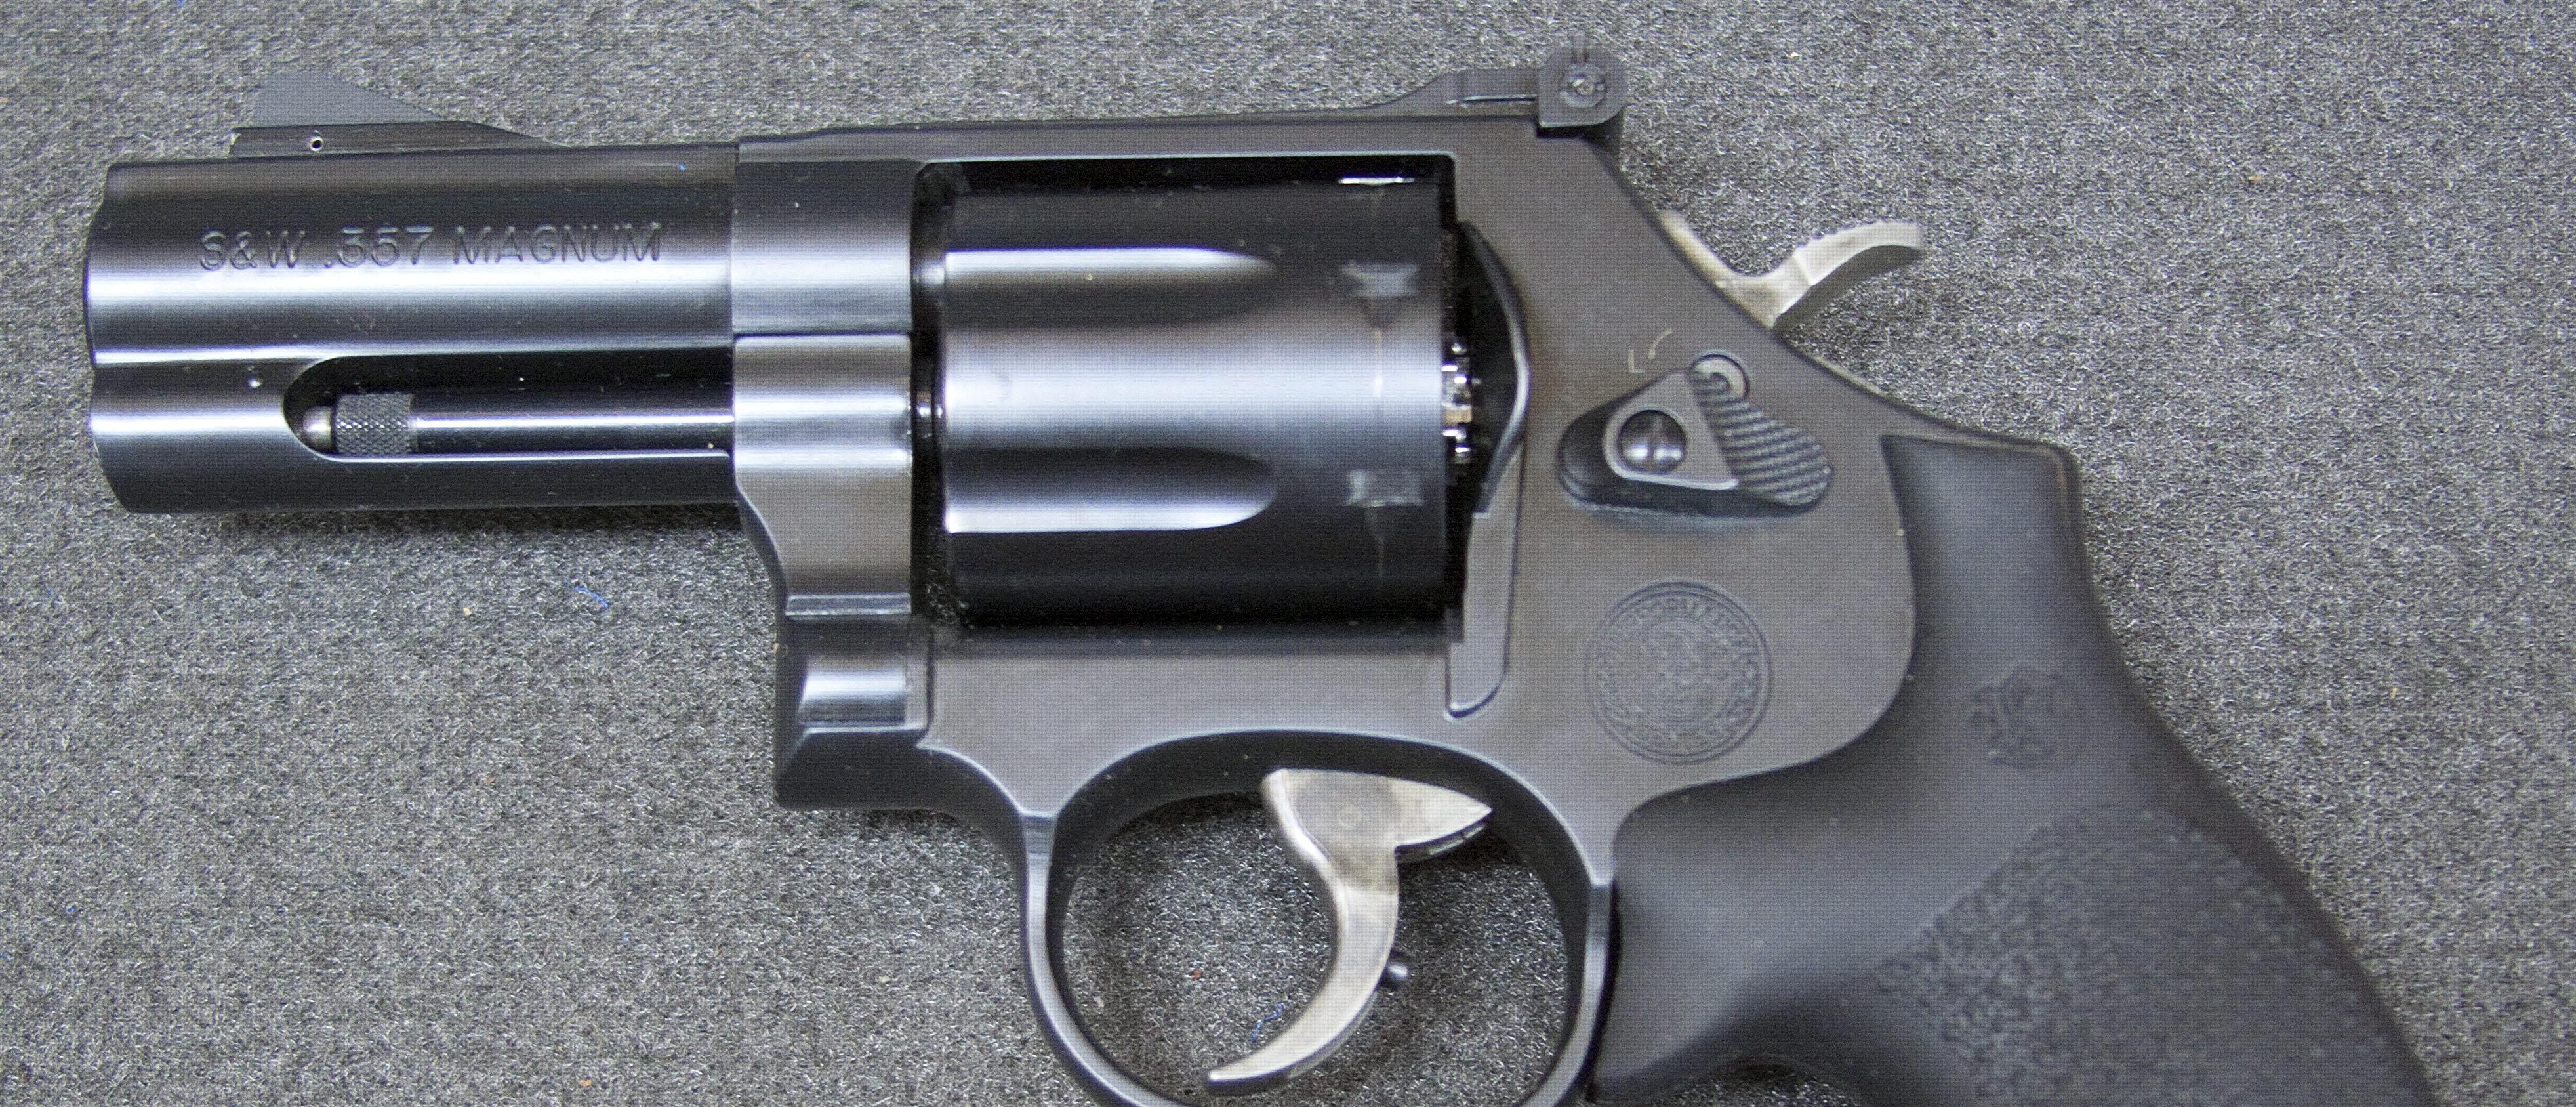 Gun Test: Smith & Wesson Performance Center 7-Shot Model 586